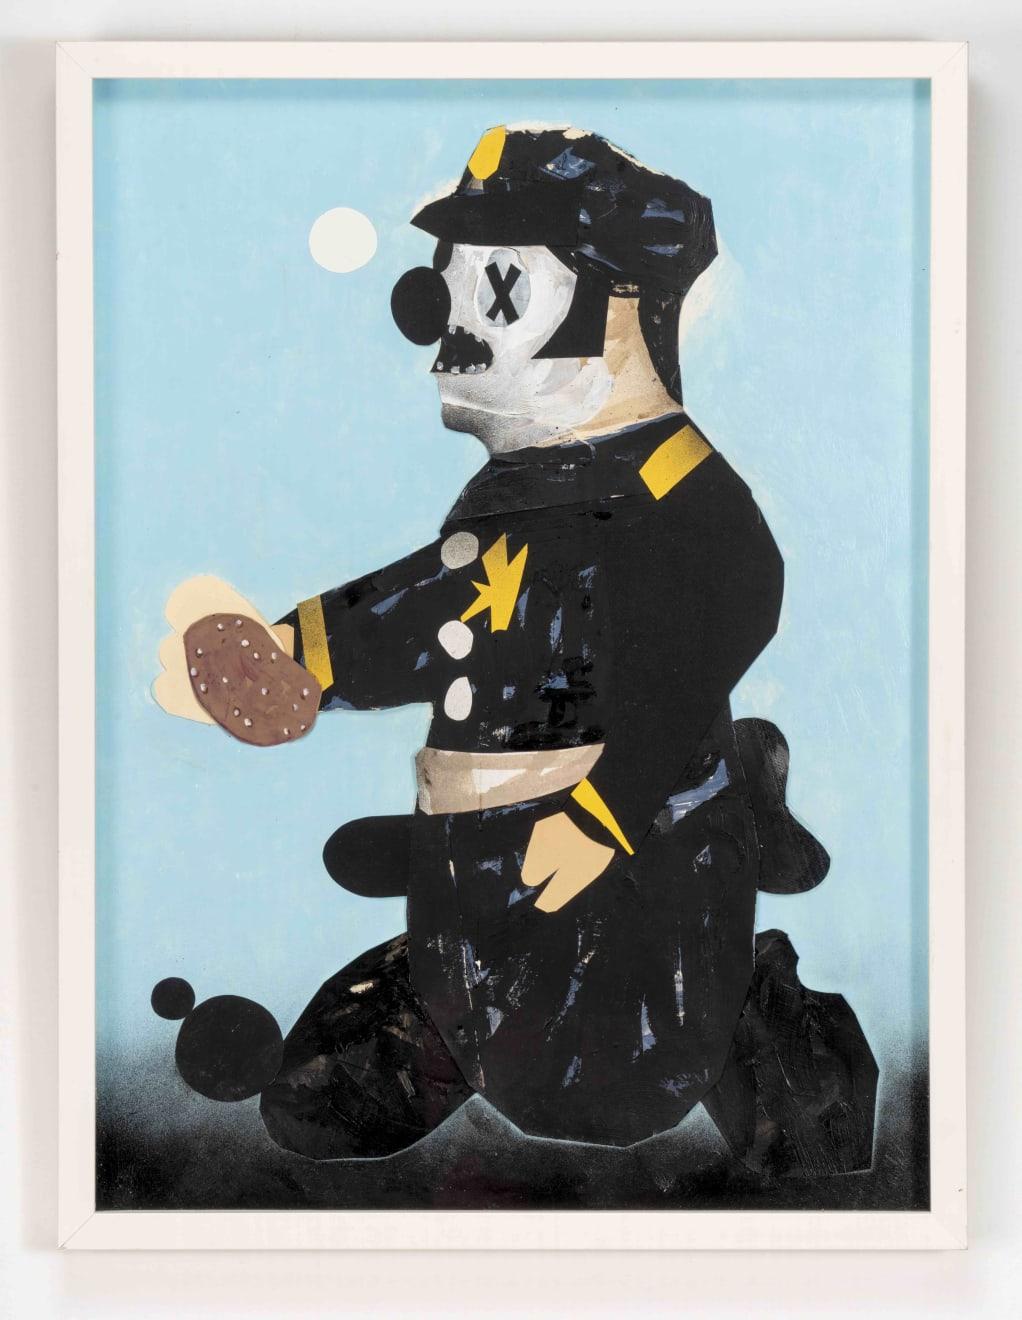 TL Solien, Cop With Potato, 2014